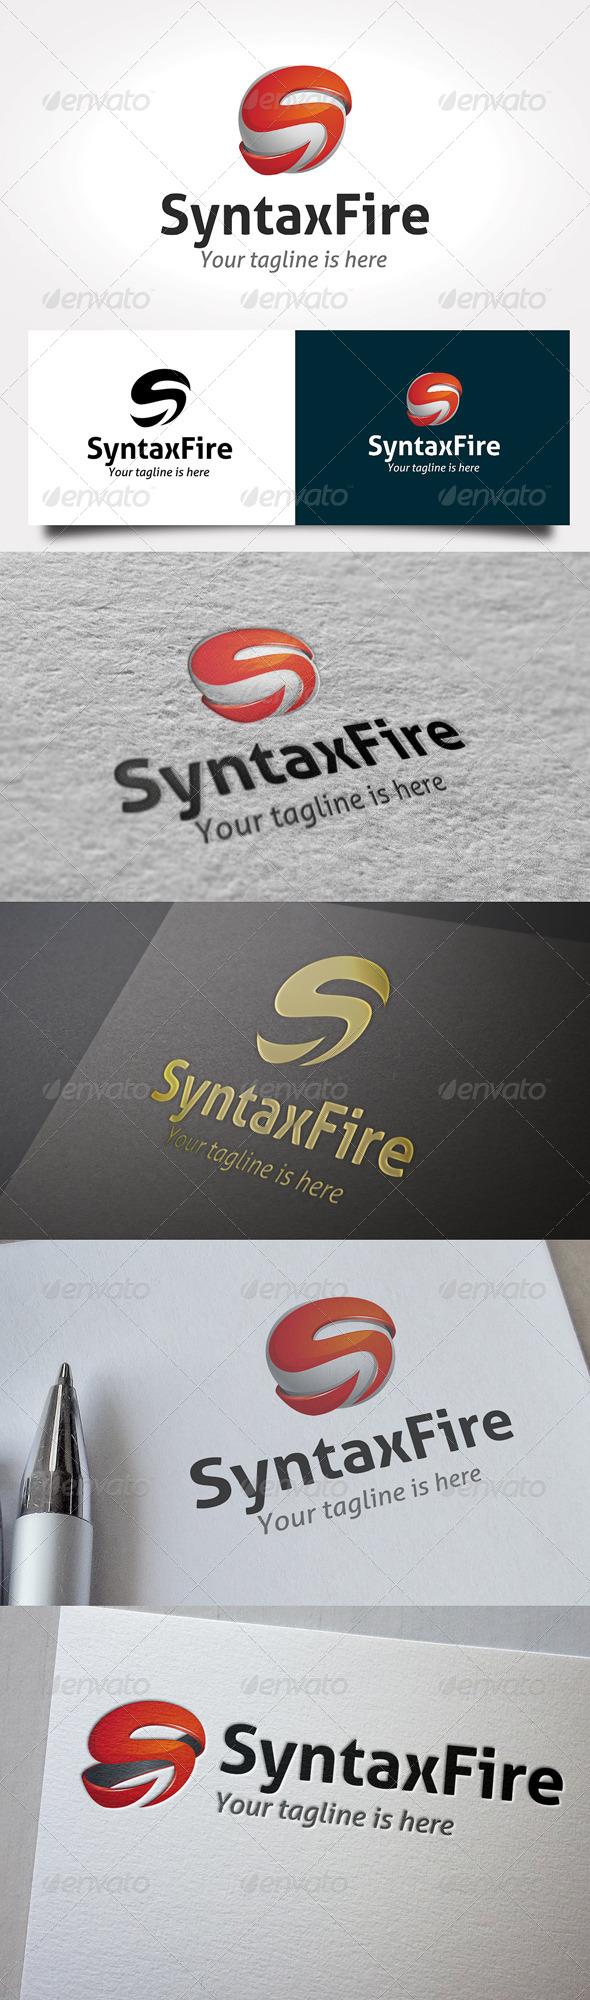 Syntax Fire Logo